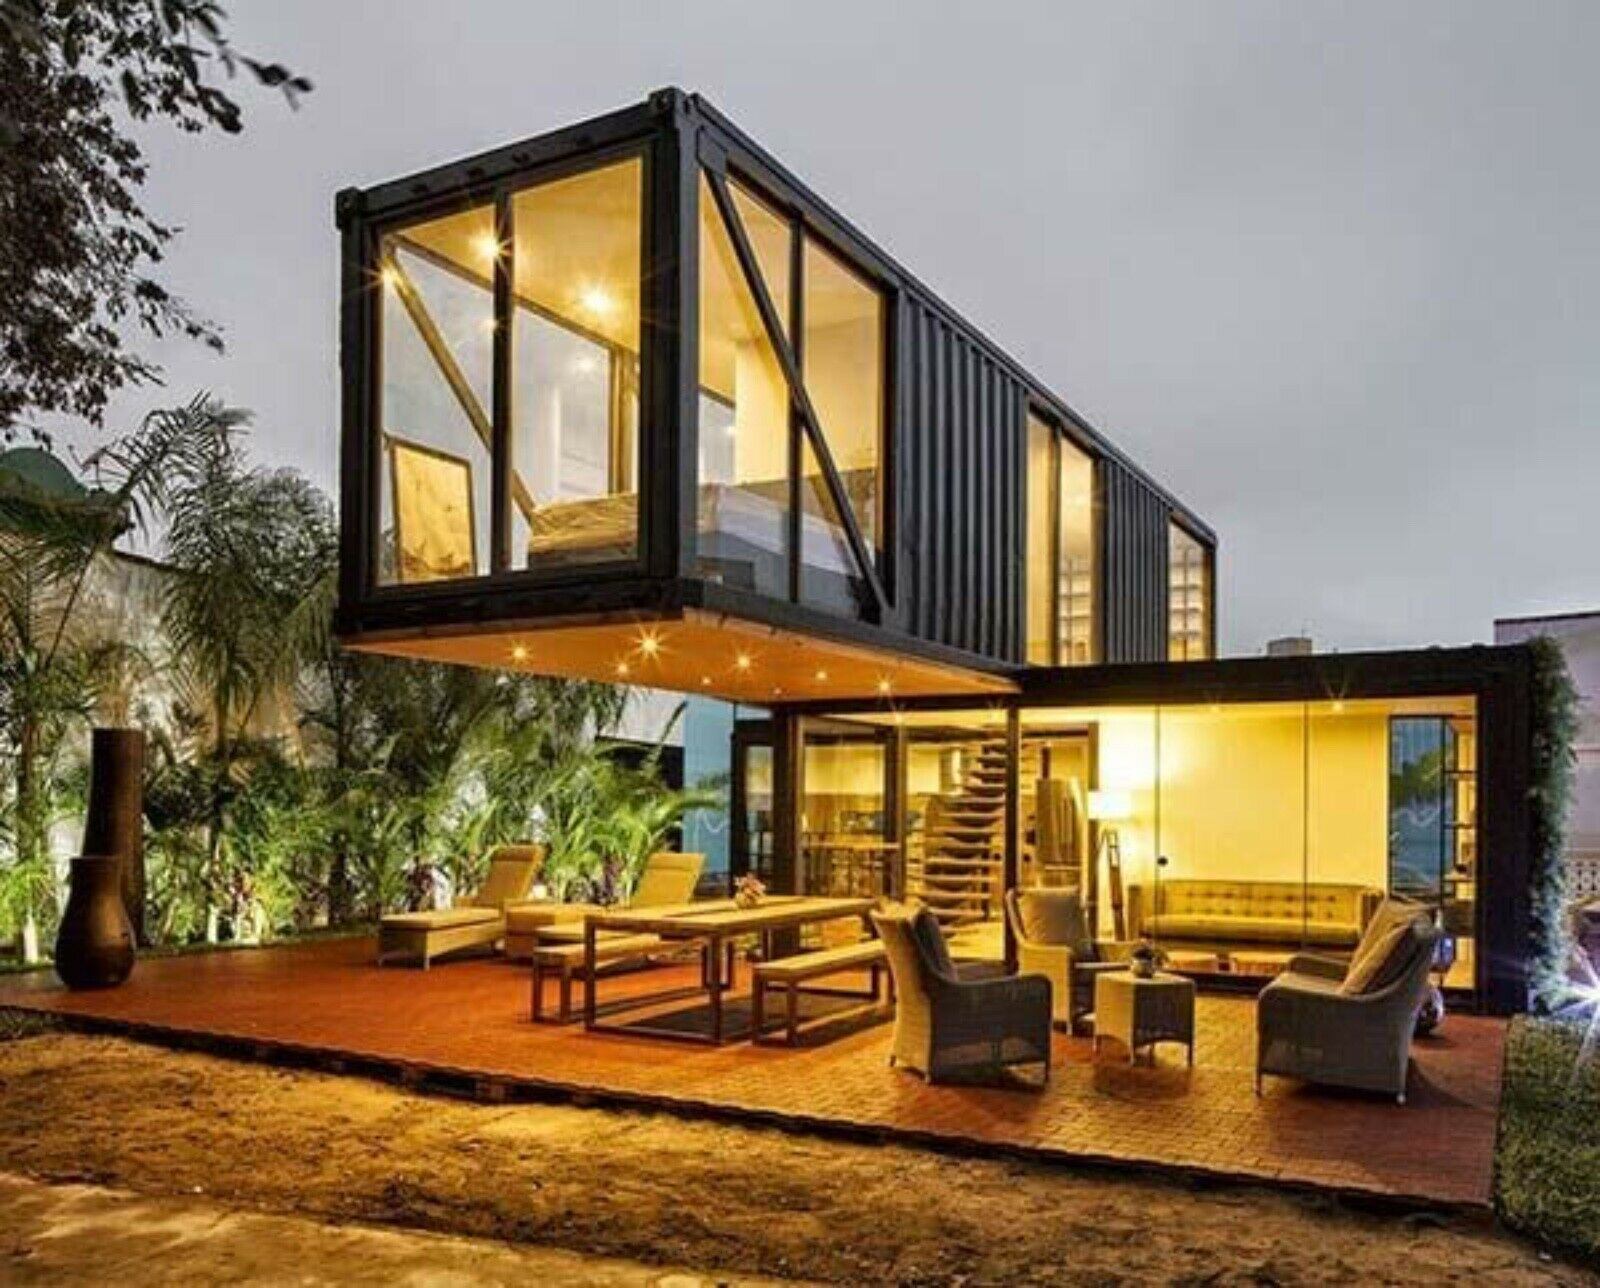 Maison Container Pourquoi Il Sera Plus Facile De La Faire Construire En France Planete Deco A Homes World 2021 âダンハウス ³ンテナハウス Ïウス